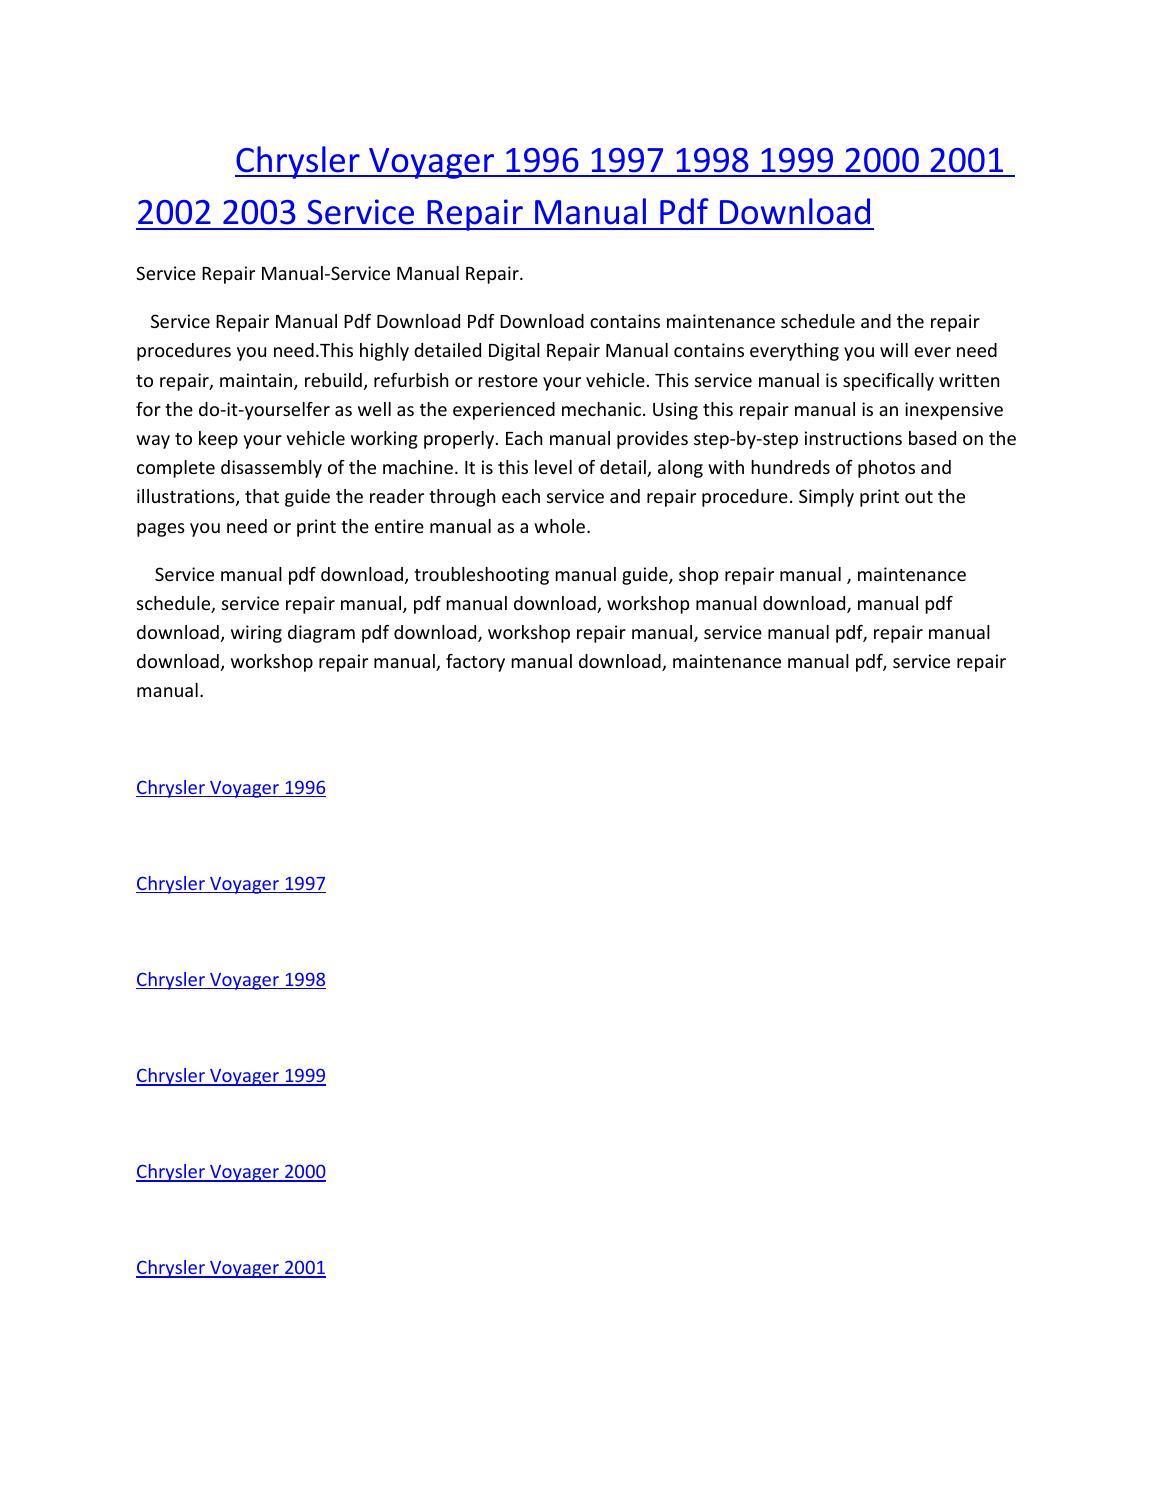 Chrysler voyager 1996 1997 1998 1999 2000 2001 2002 2003 service manual  repair pdf download by amurgului - issuu